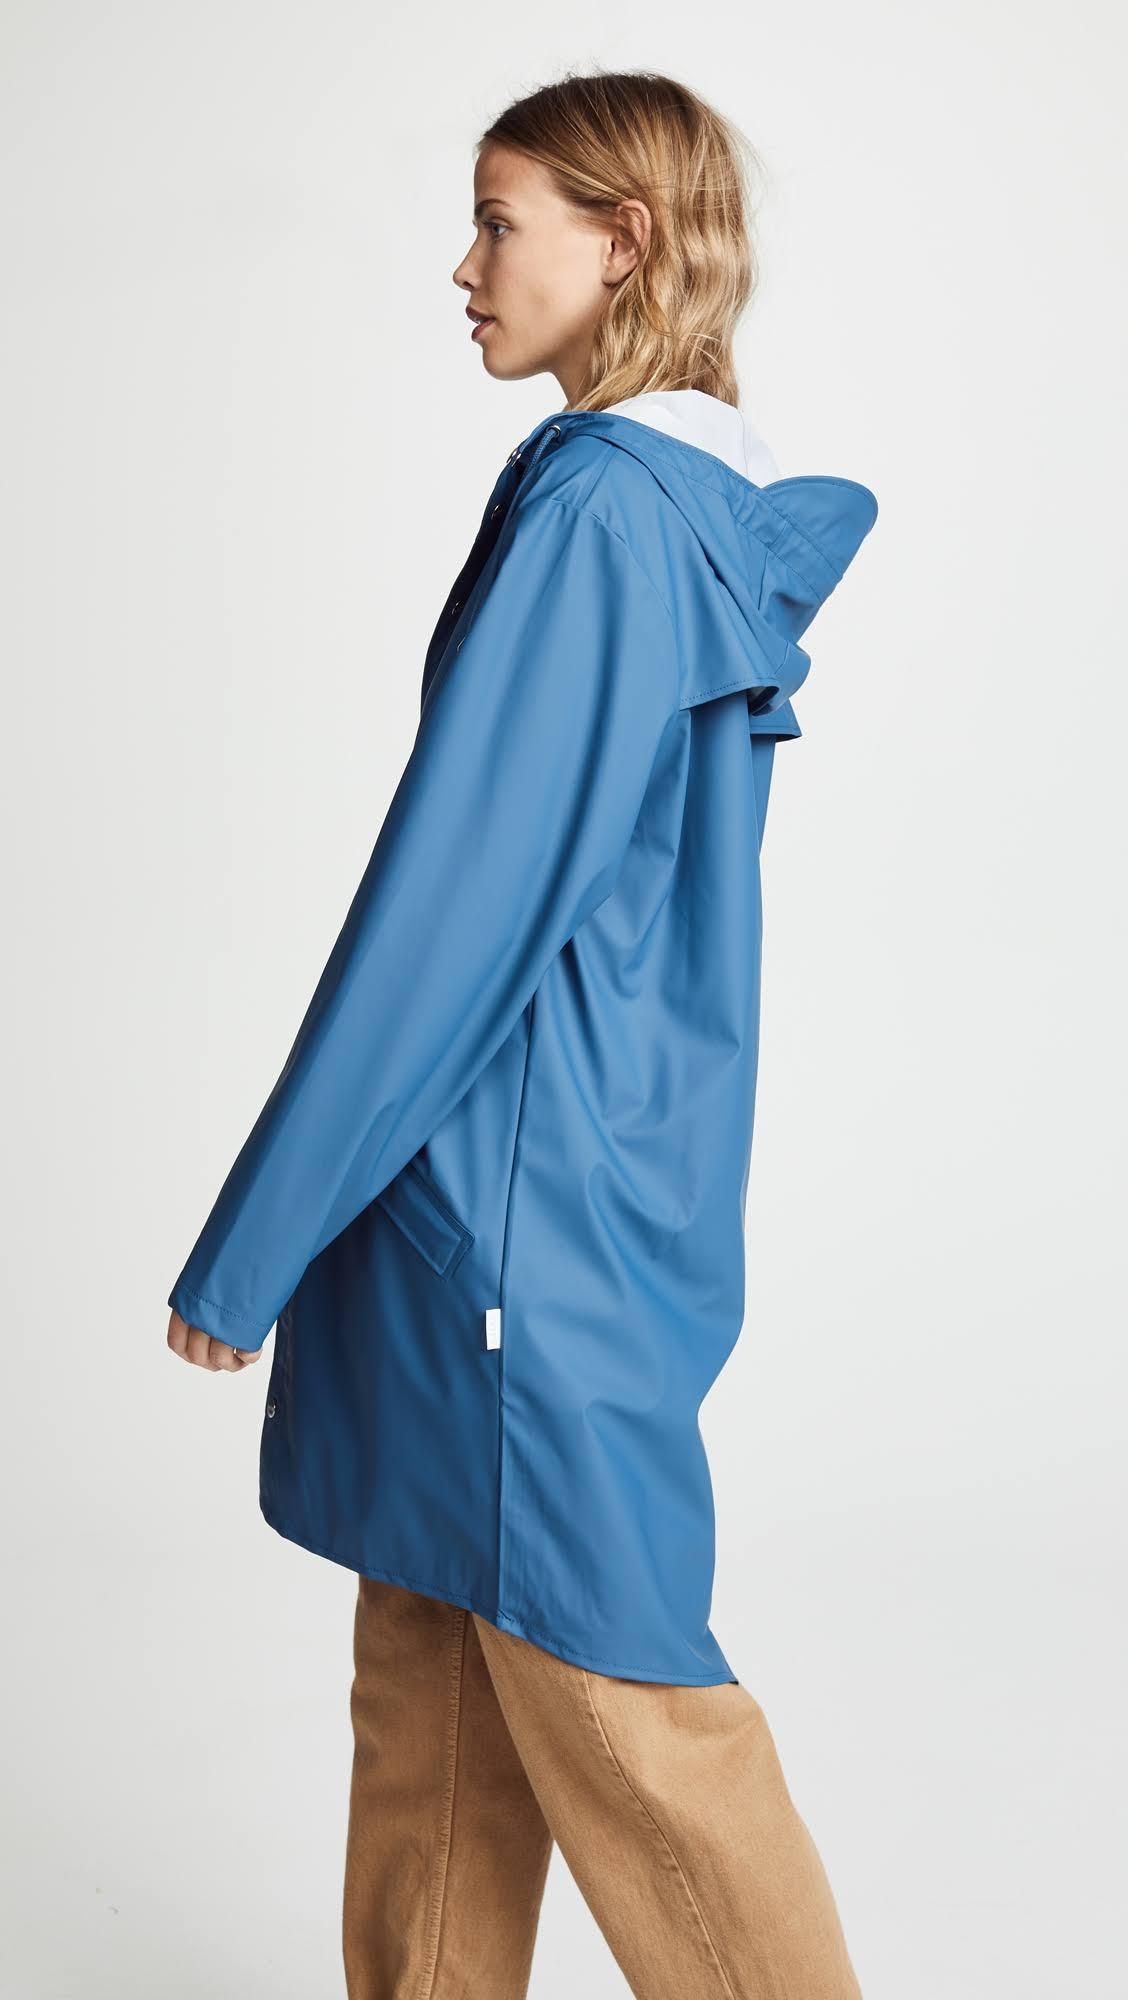 Chaqueta Faded Blue s Para Larga Xs Mujer Rains aqwa1HrT